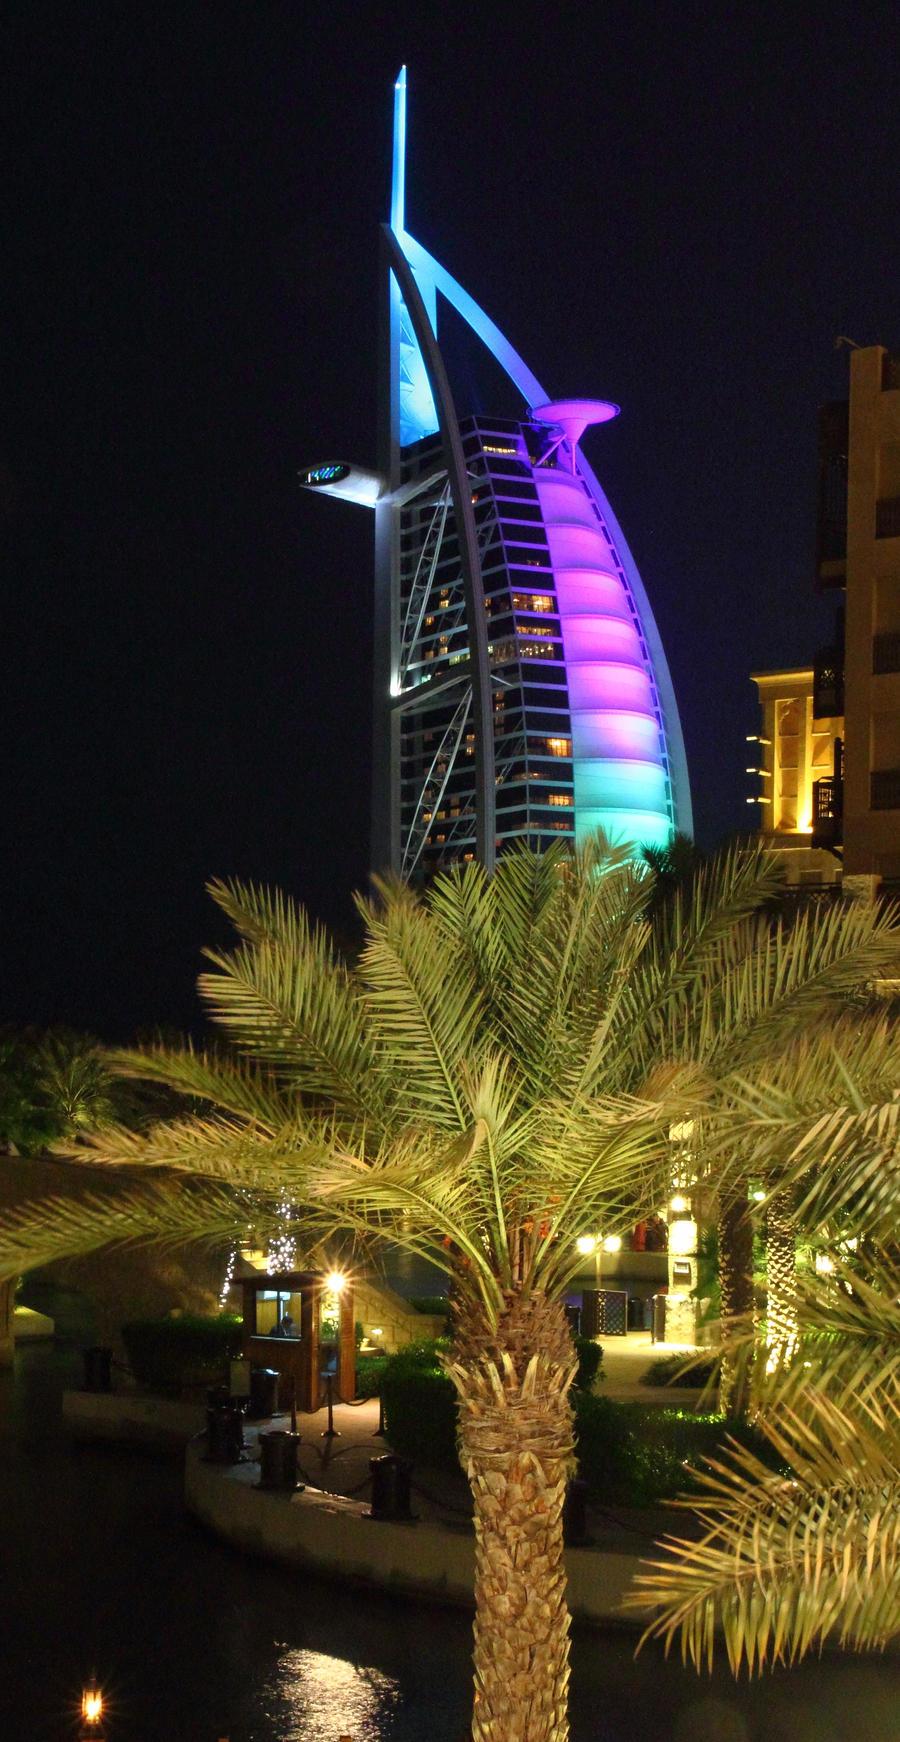 Burg al arab hotel dubai by grosvenor photos on deviantart for The burg hotel dubai